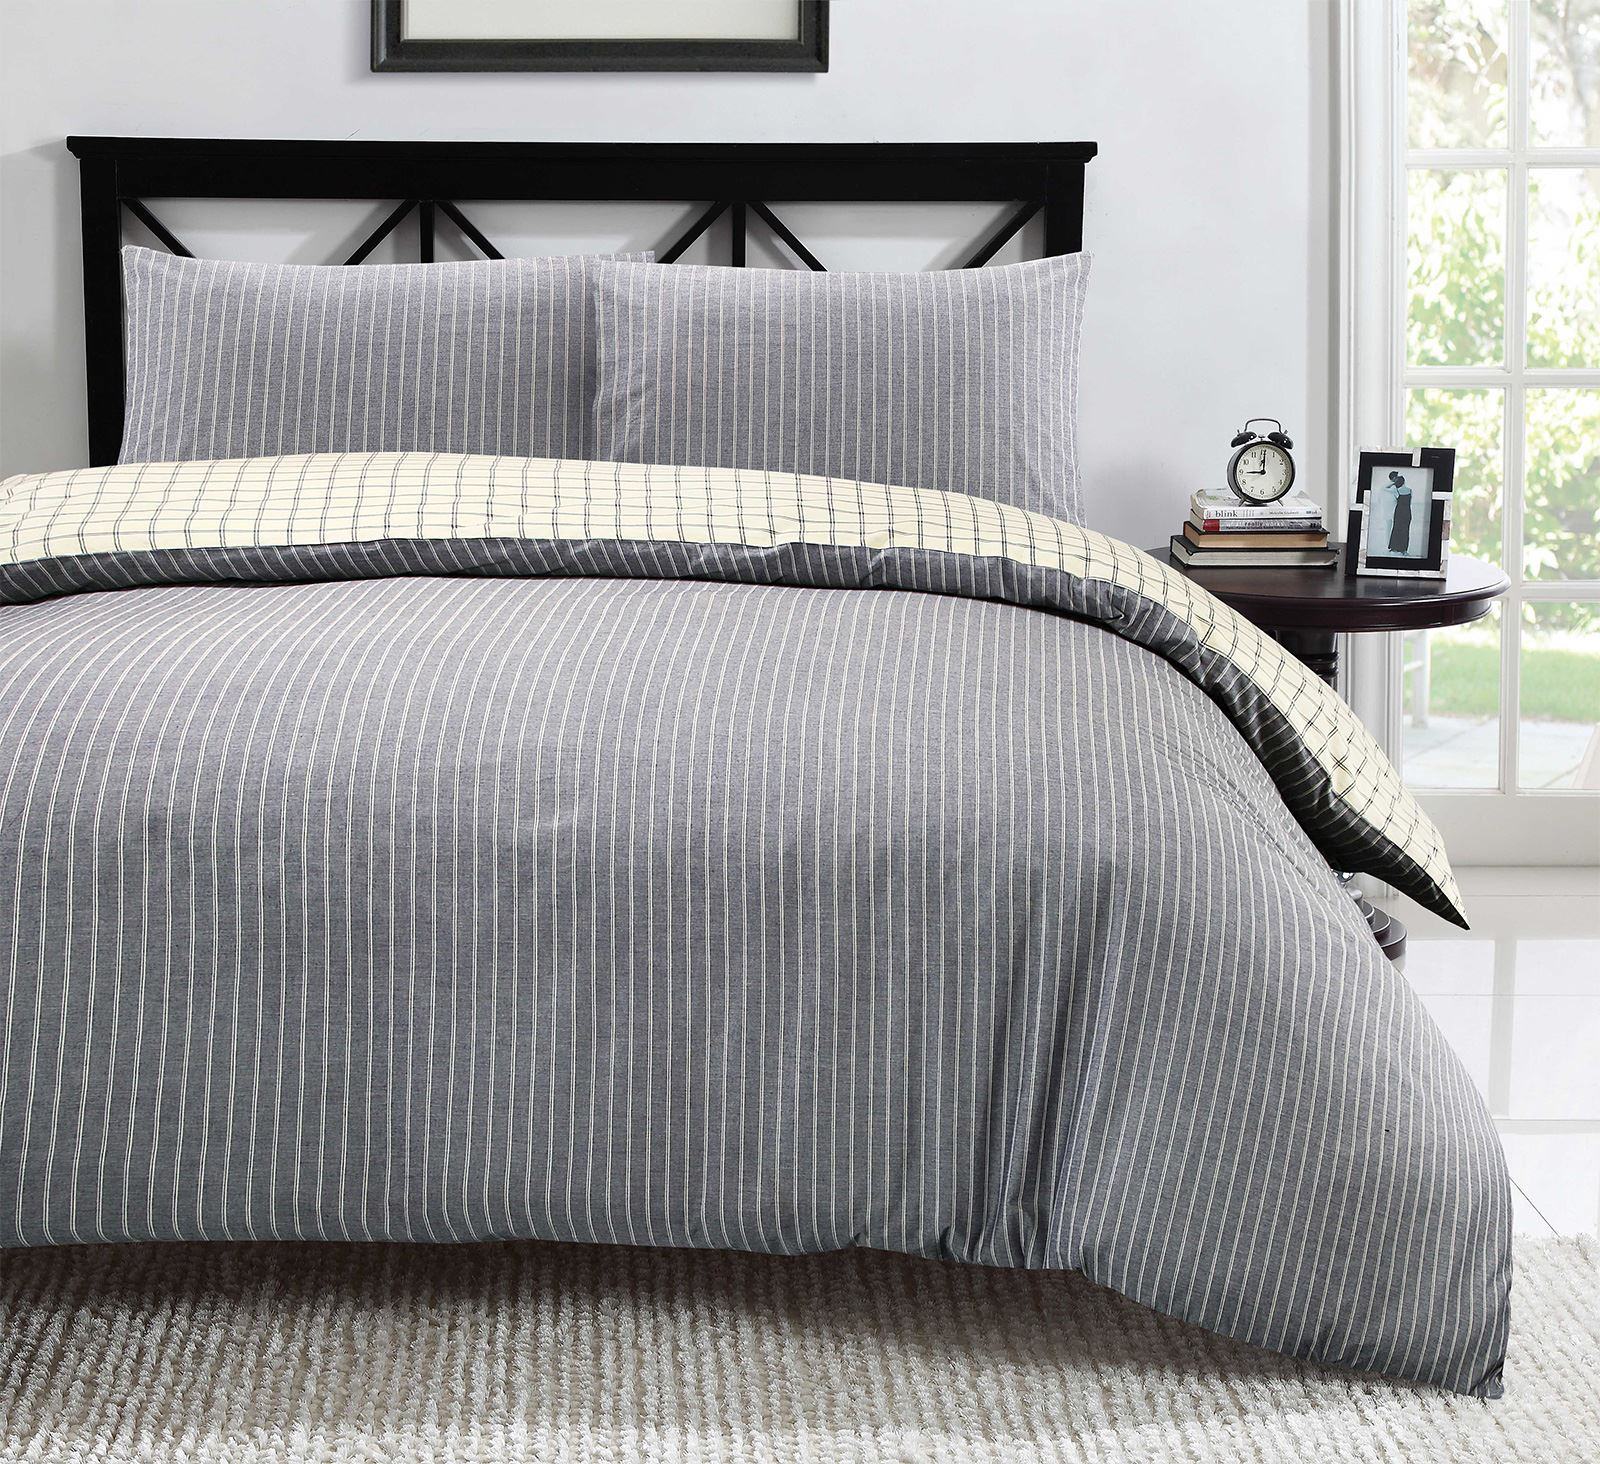 100-algodon-duvet-cover-set-raya-Cuadros-Reversible-Ropa-De-Cama-Individual-Doble-King miniatura 5